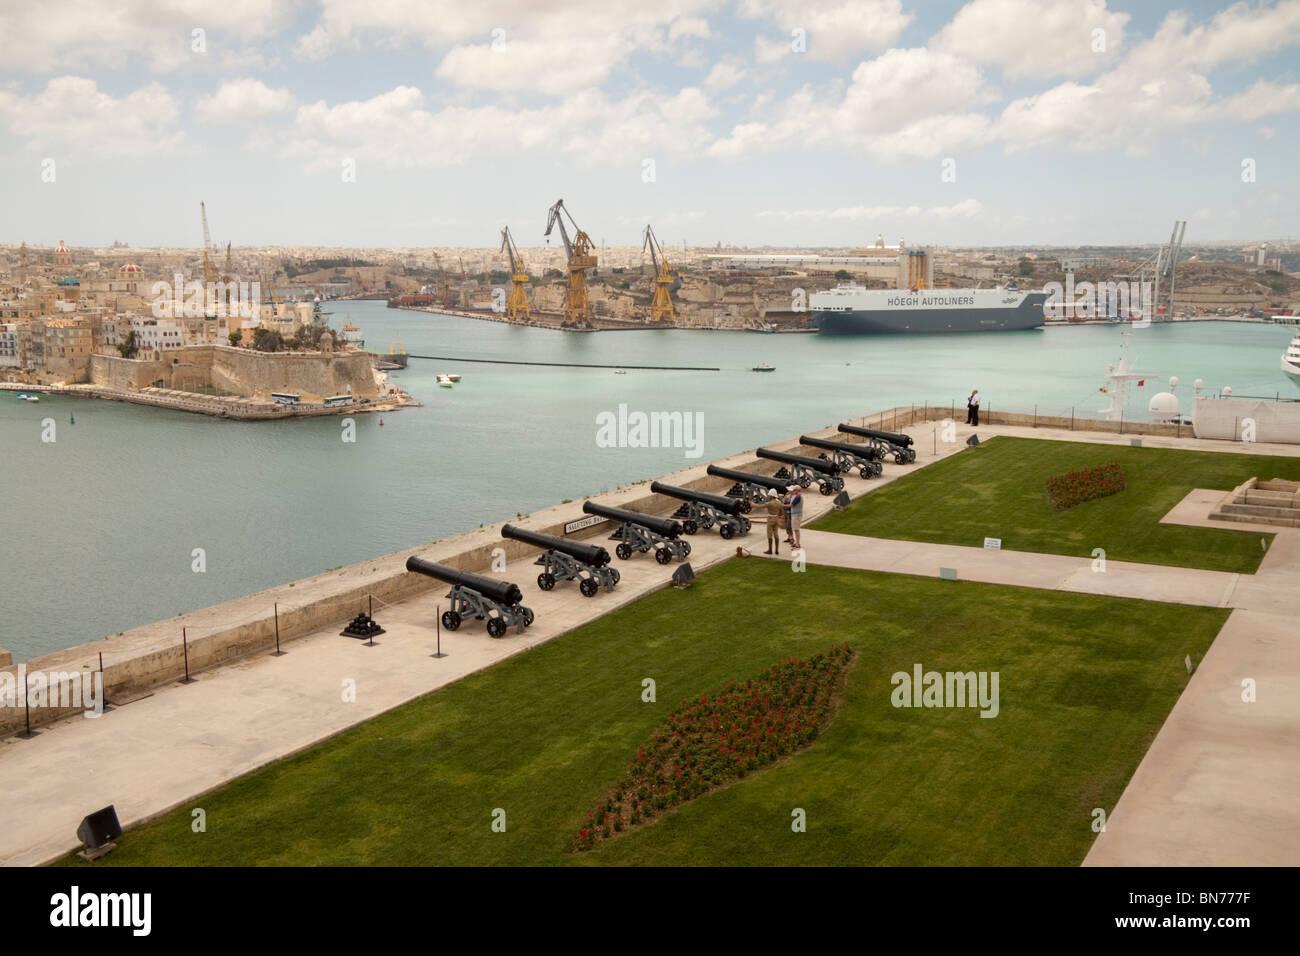 Saluting Battery, Grand Harbour, Valletta, Malta - Stock Image